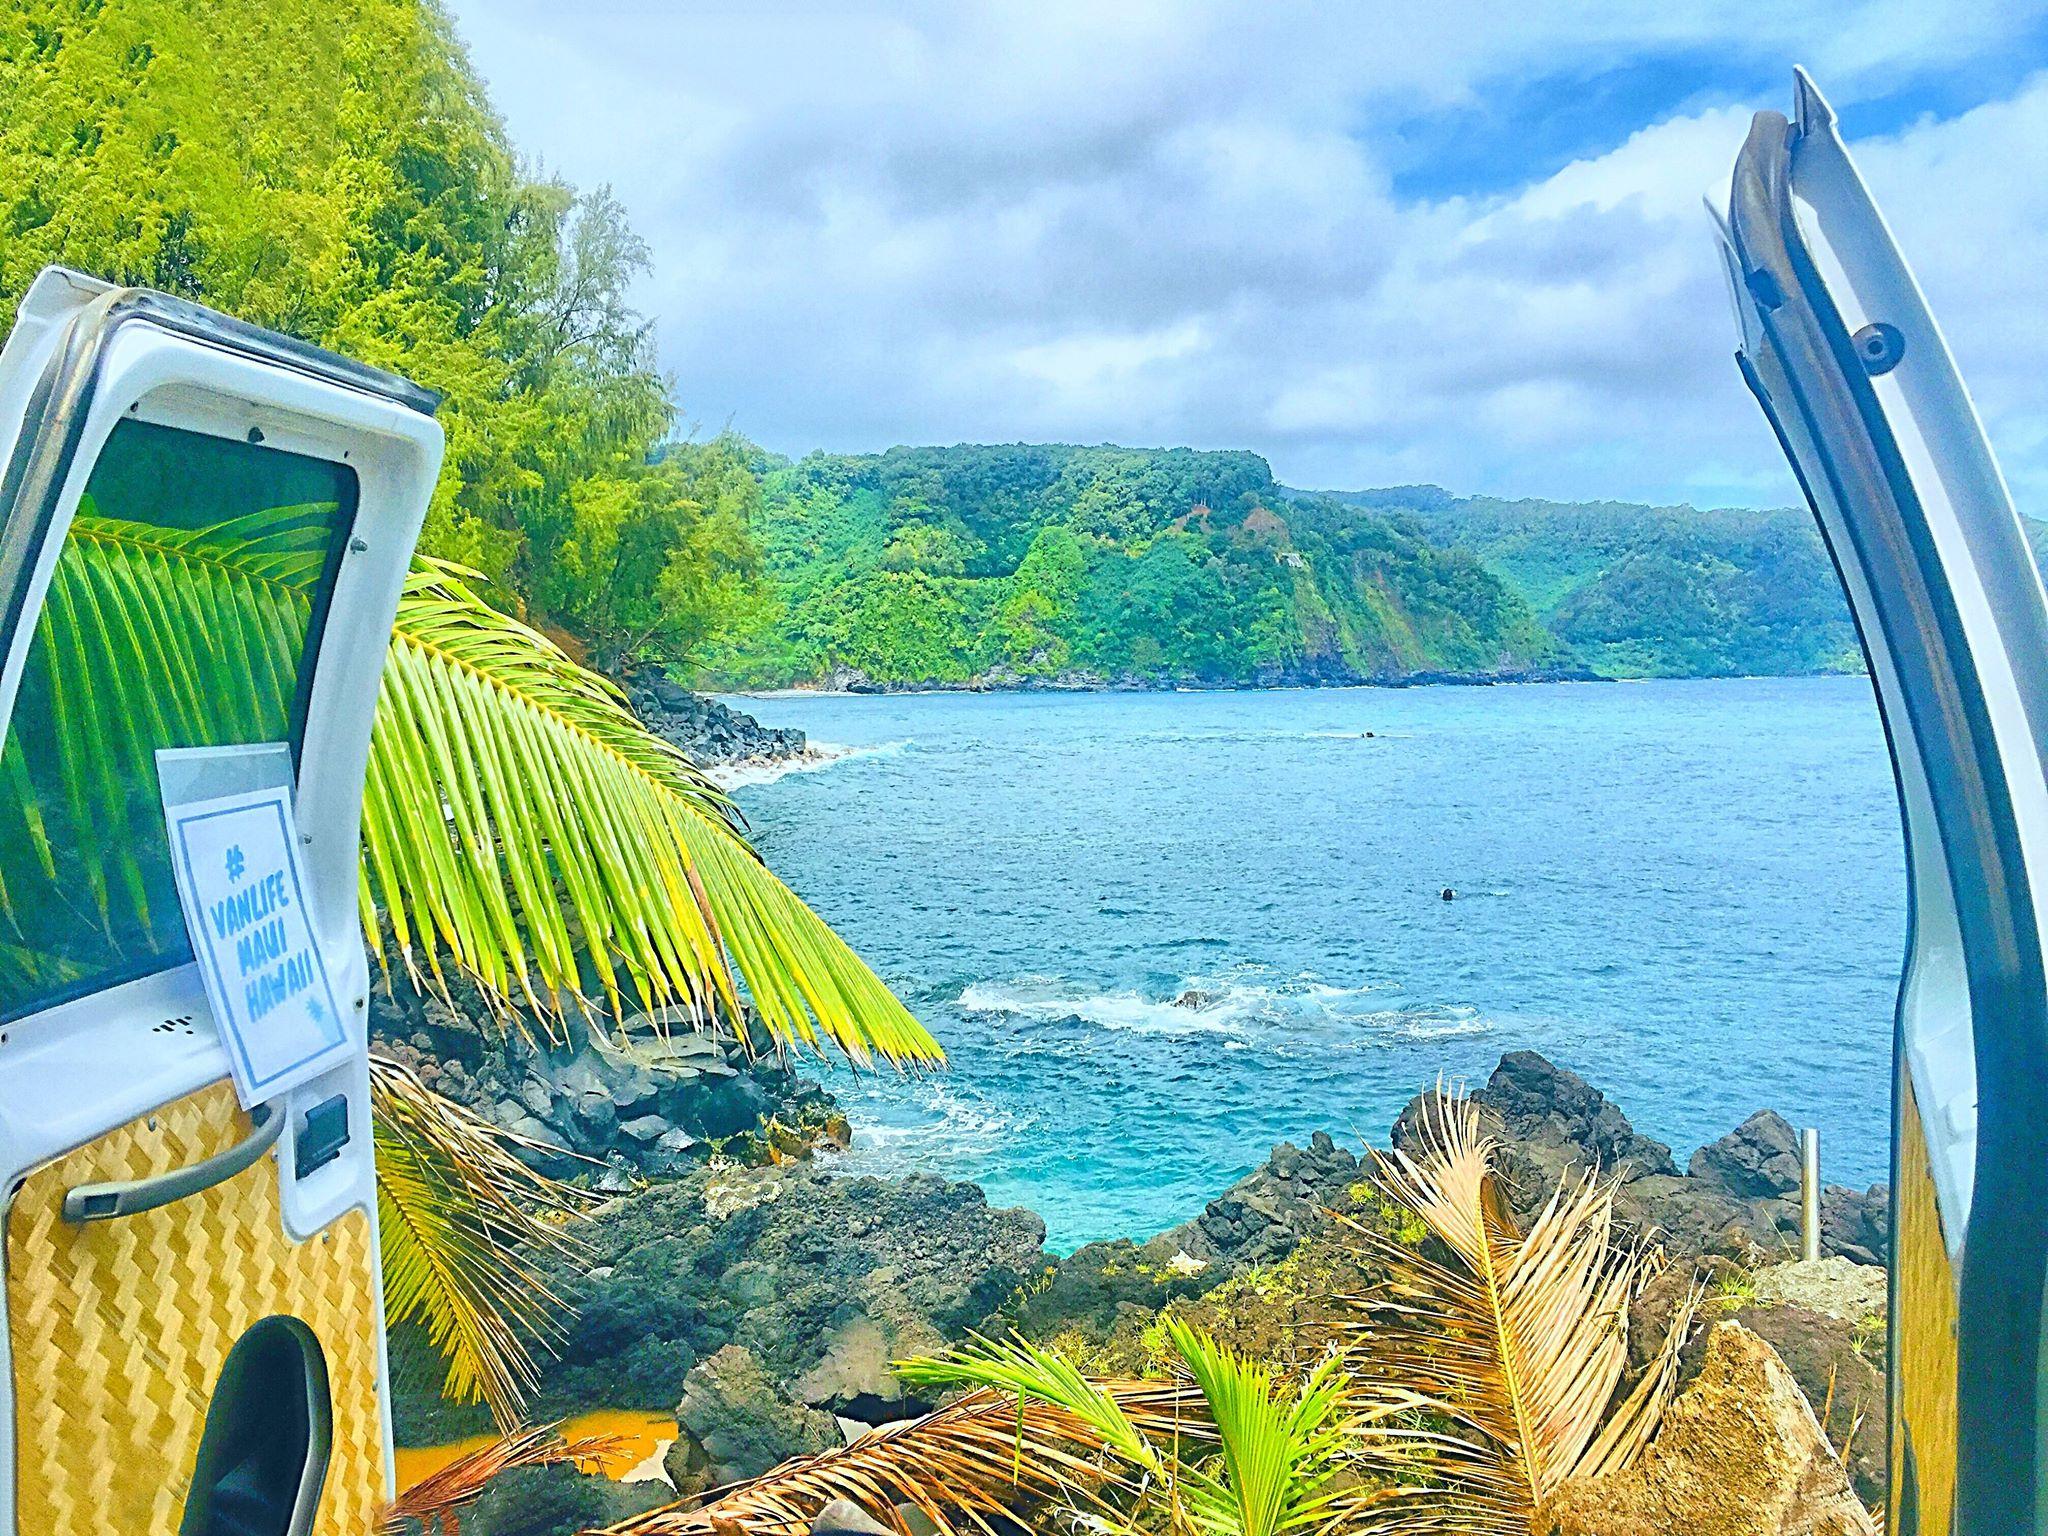 vanlife maui van life maui camper van campervan rental fully equipped cloud 9 haleakala volcano road to hana off grid solar panel refrigerator romantic getaway